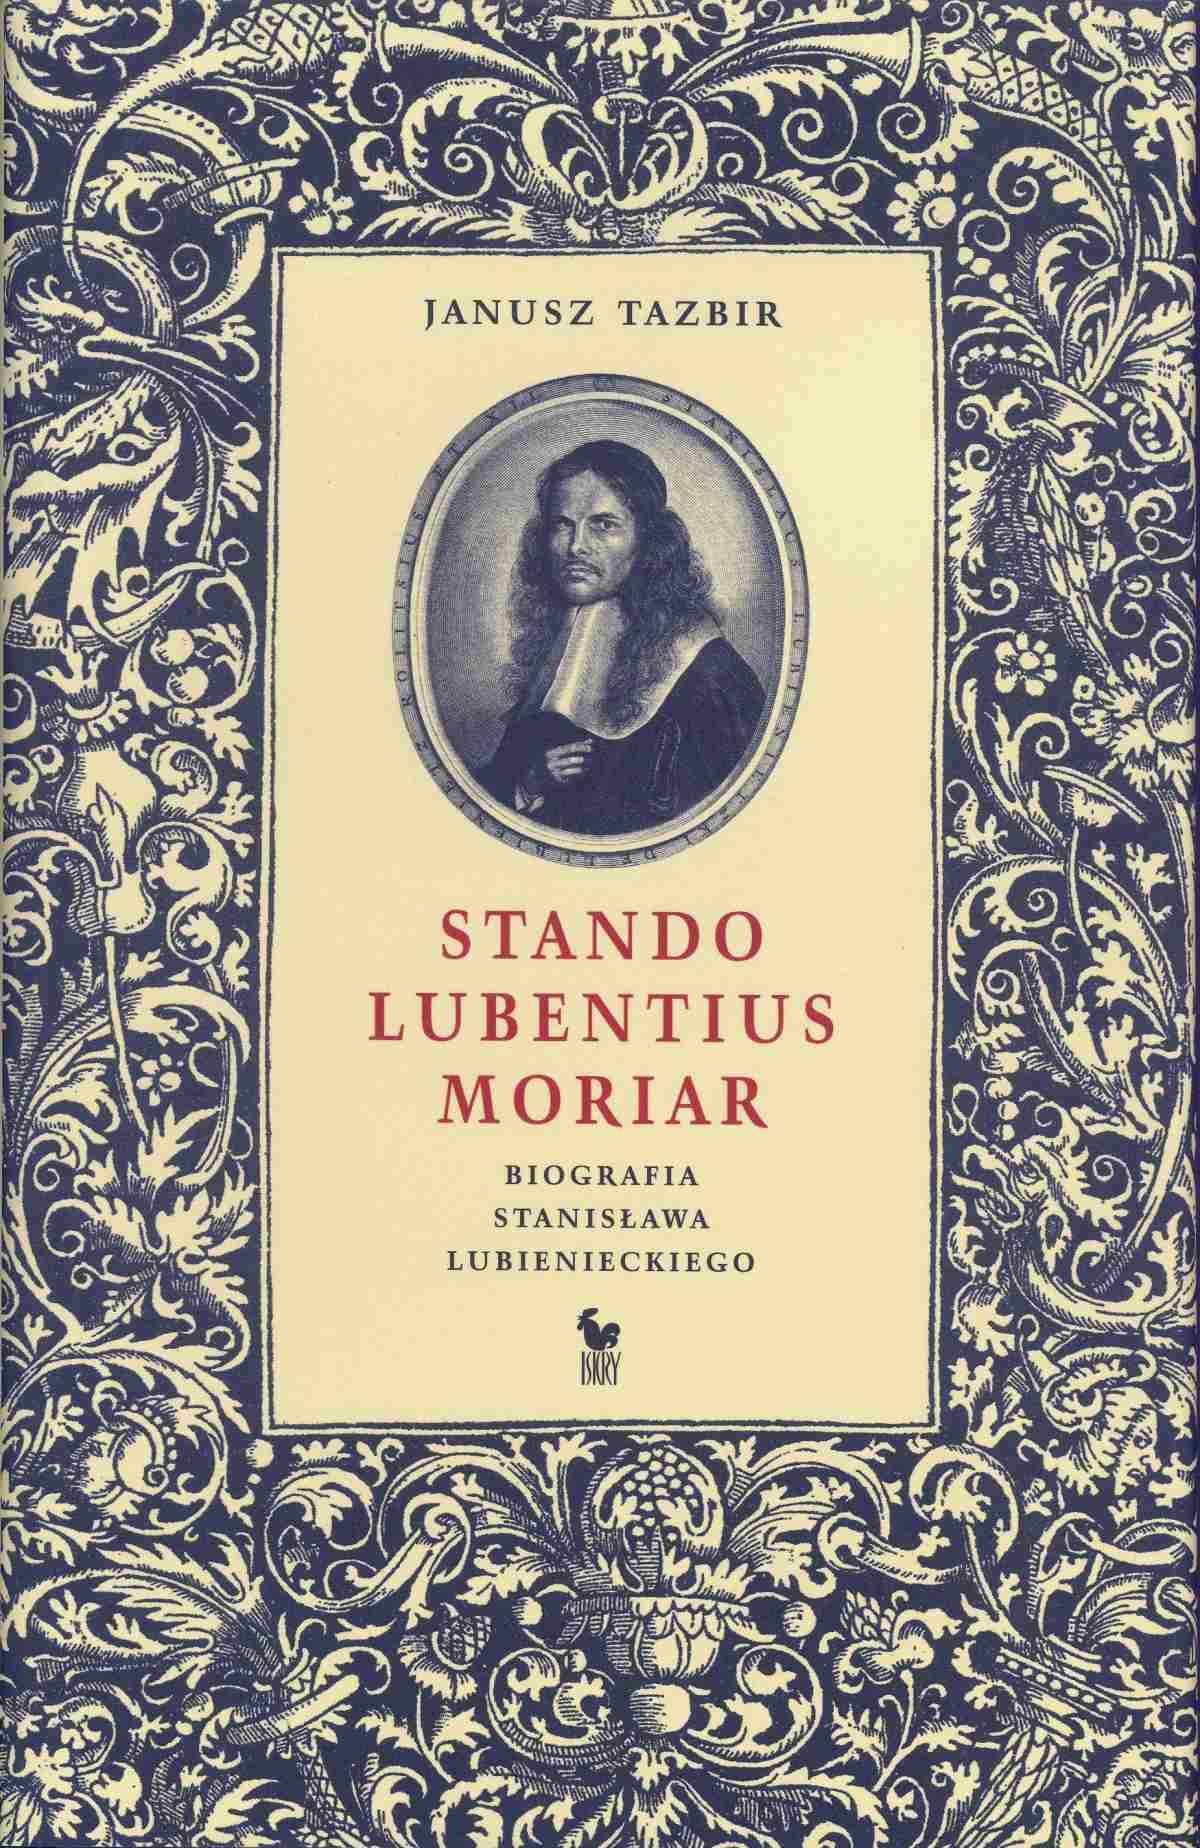 Stando Lubentius Moriar - Ebook (Książka EPUB) do pobrania w formacie EPUB